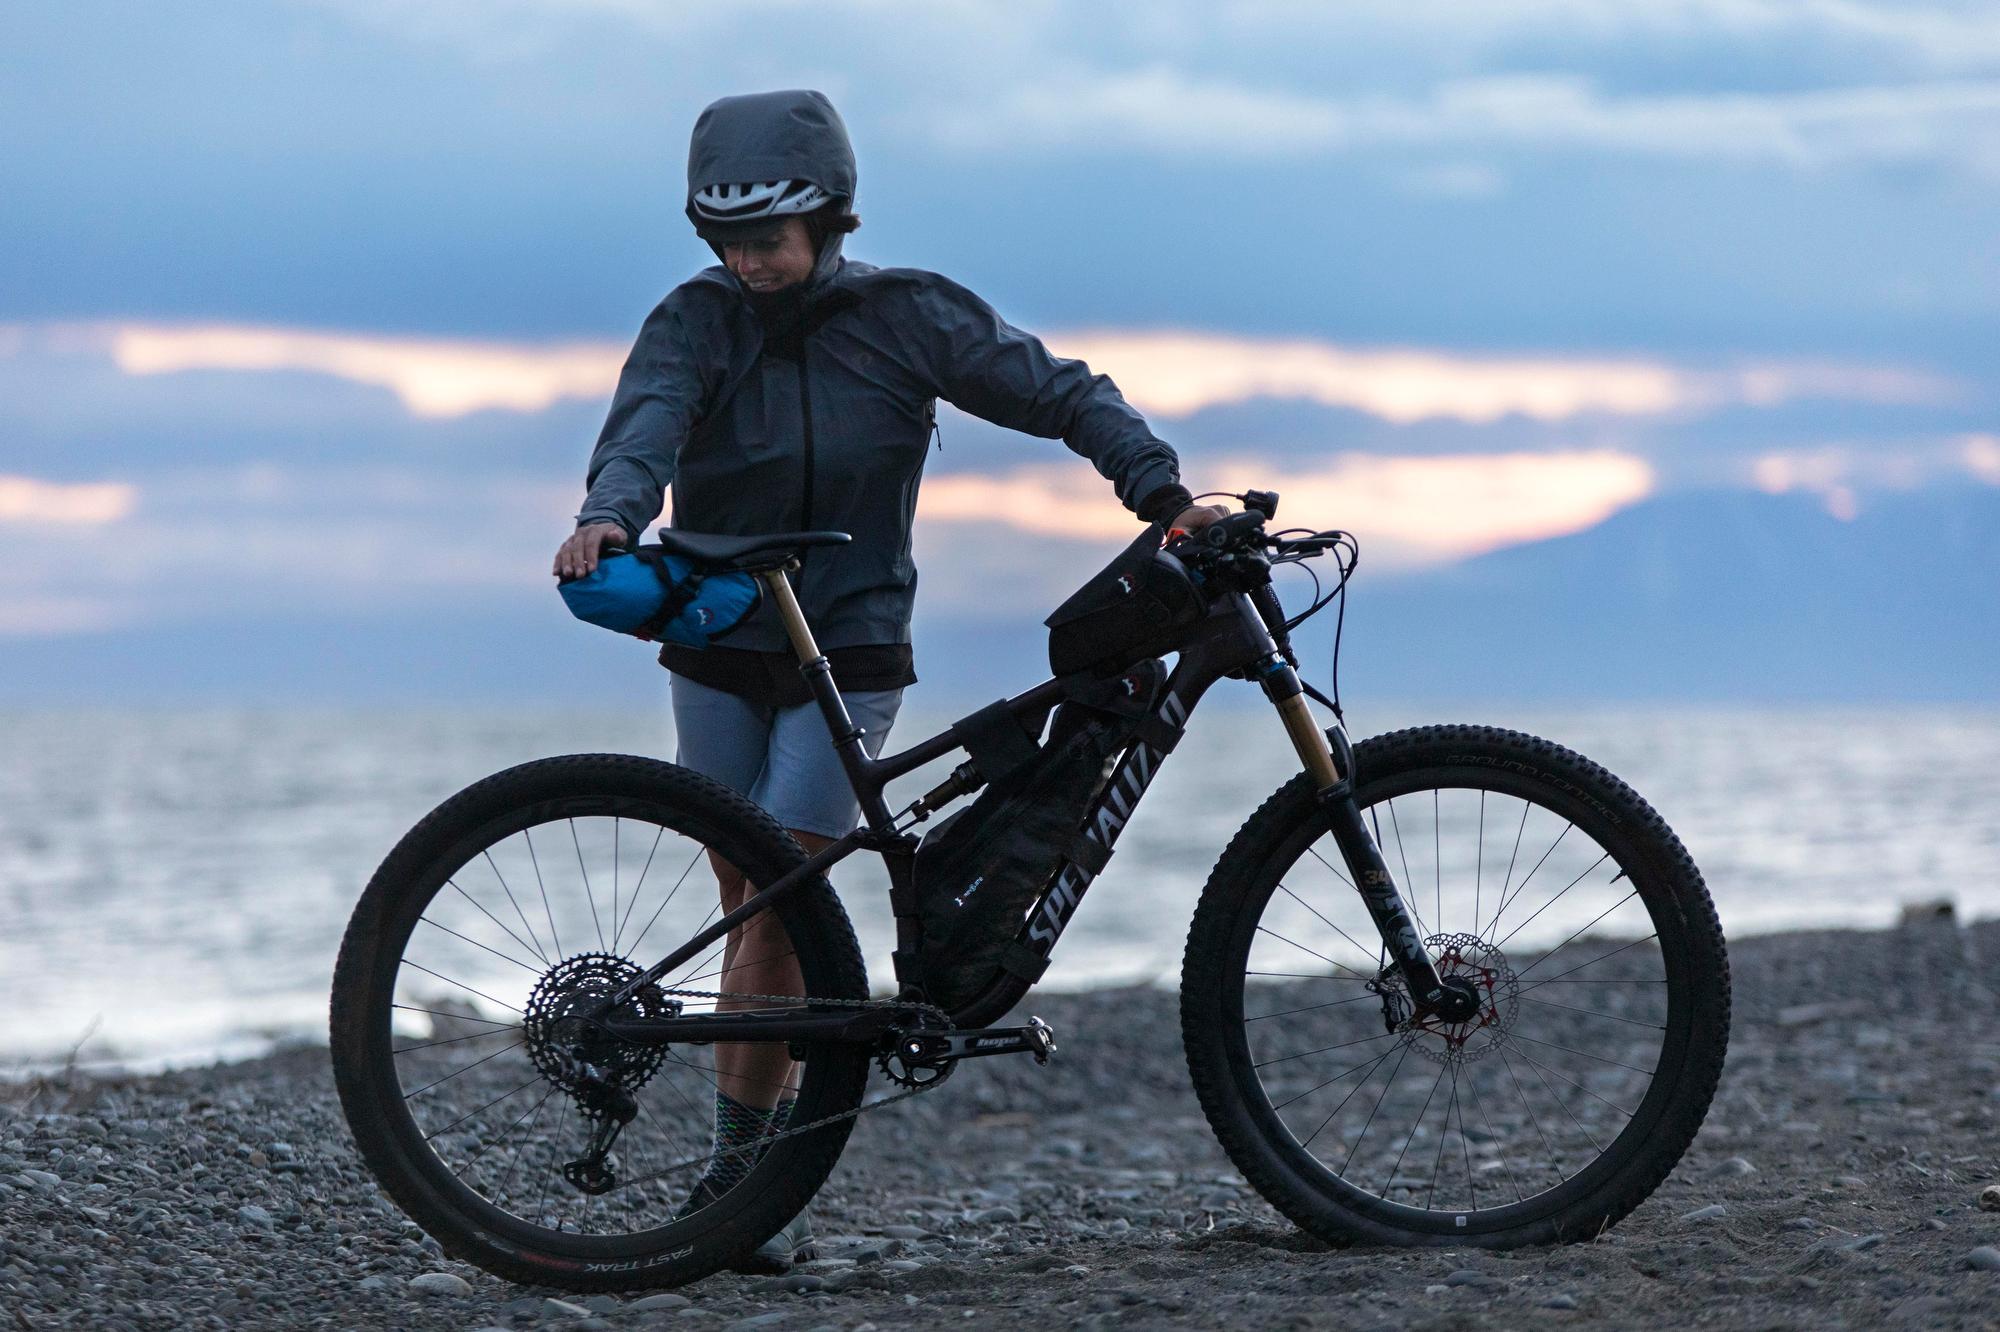 Lael Wilcox Kenai 250 Bike & Gear 007